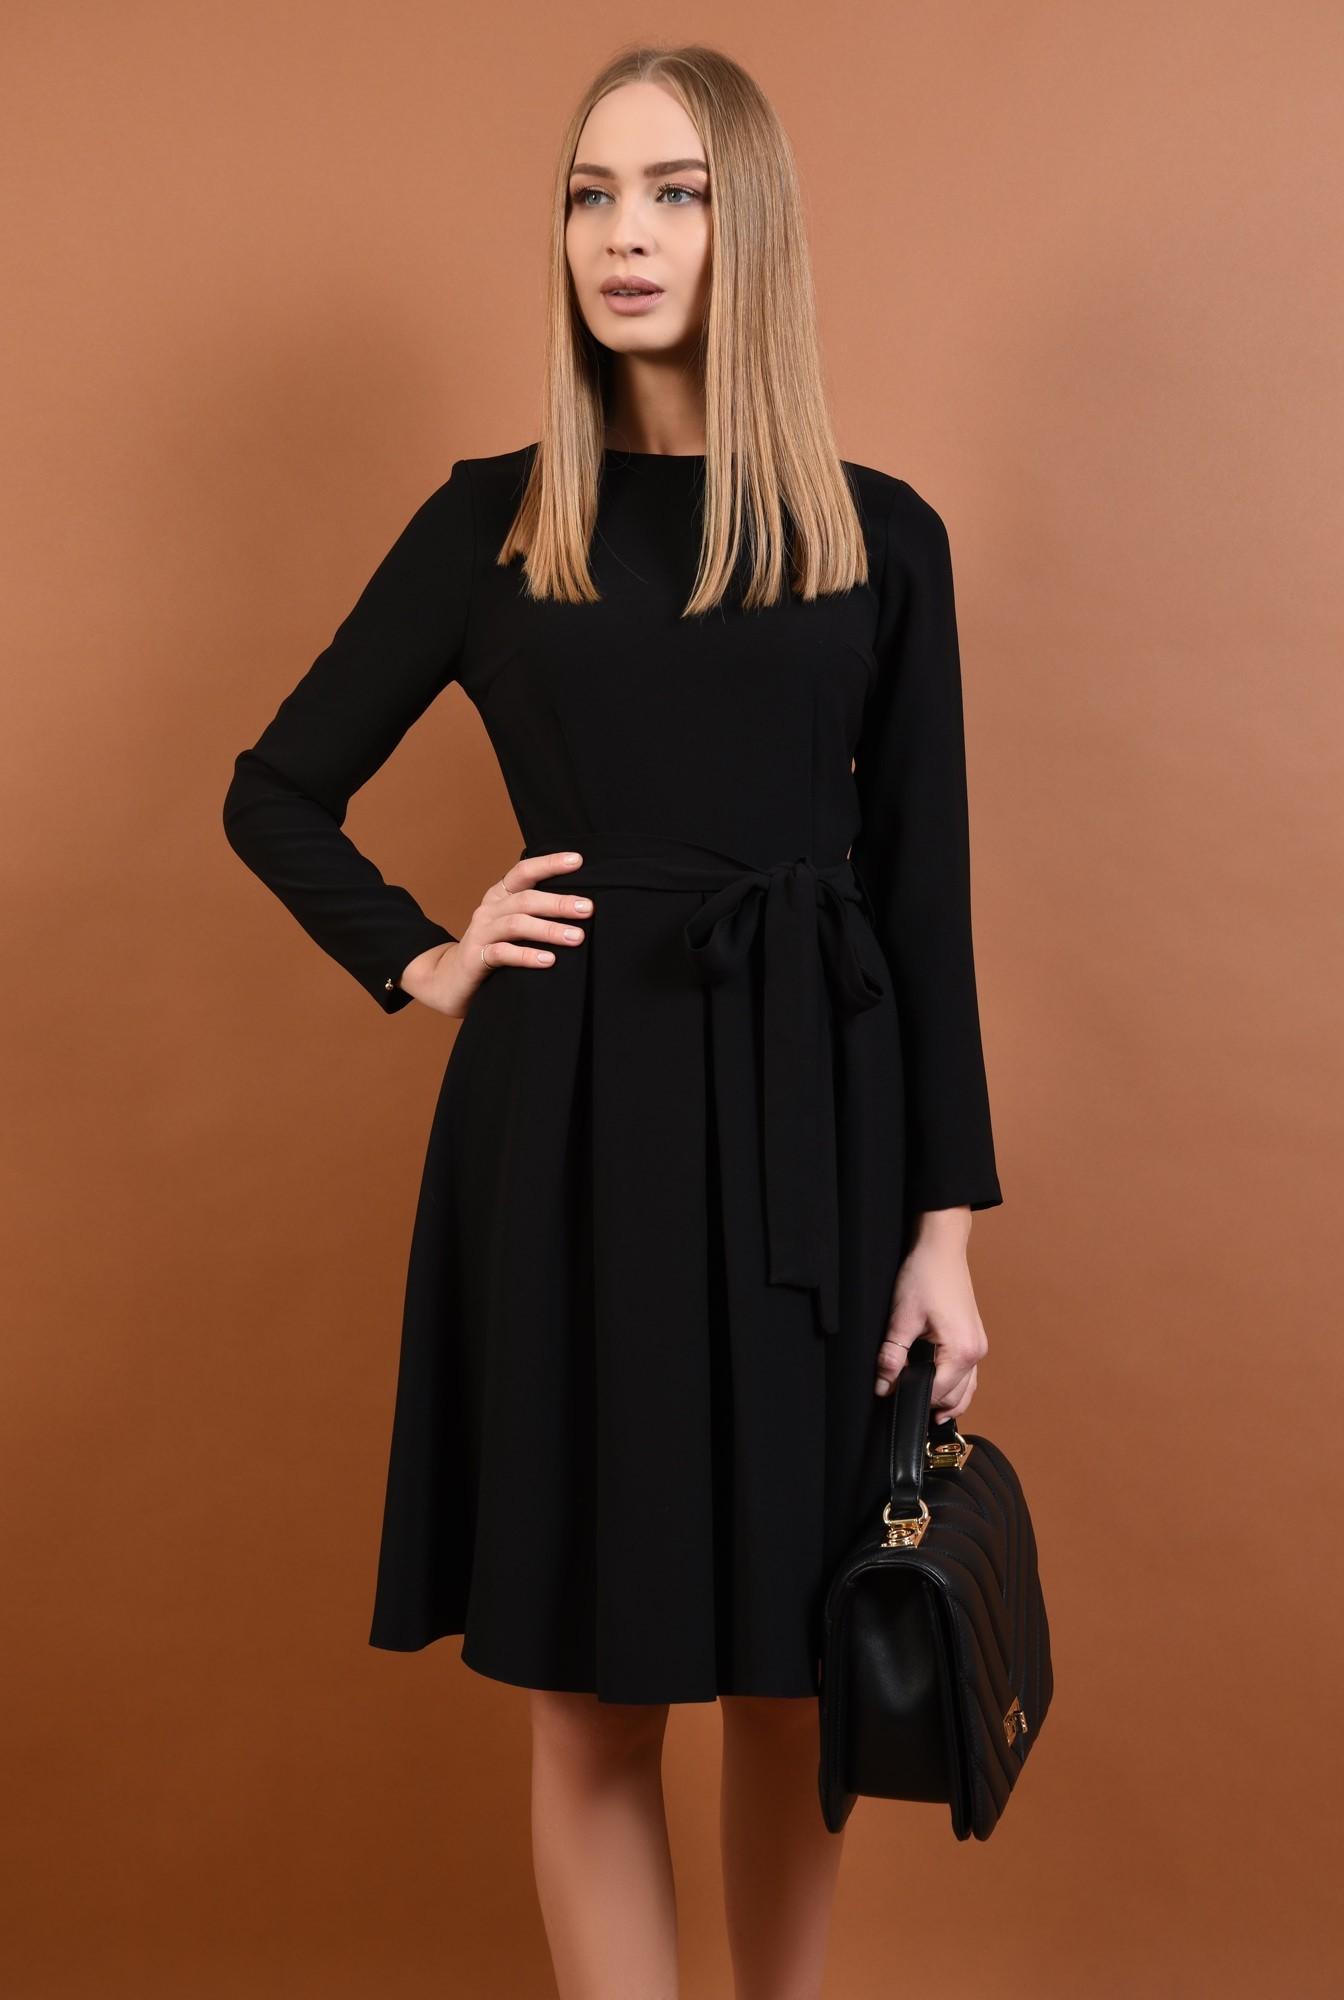 0 - 360 - rochie casual evazata, pliseuri late, cordon, funda, negru